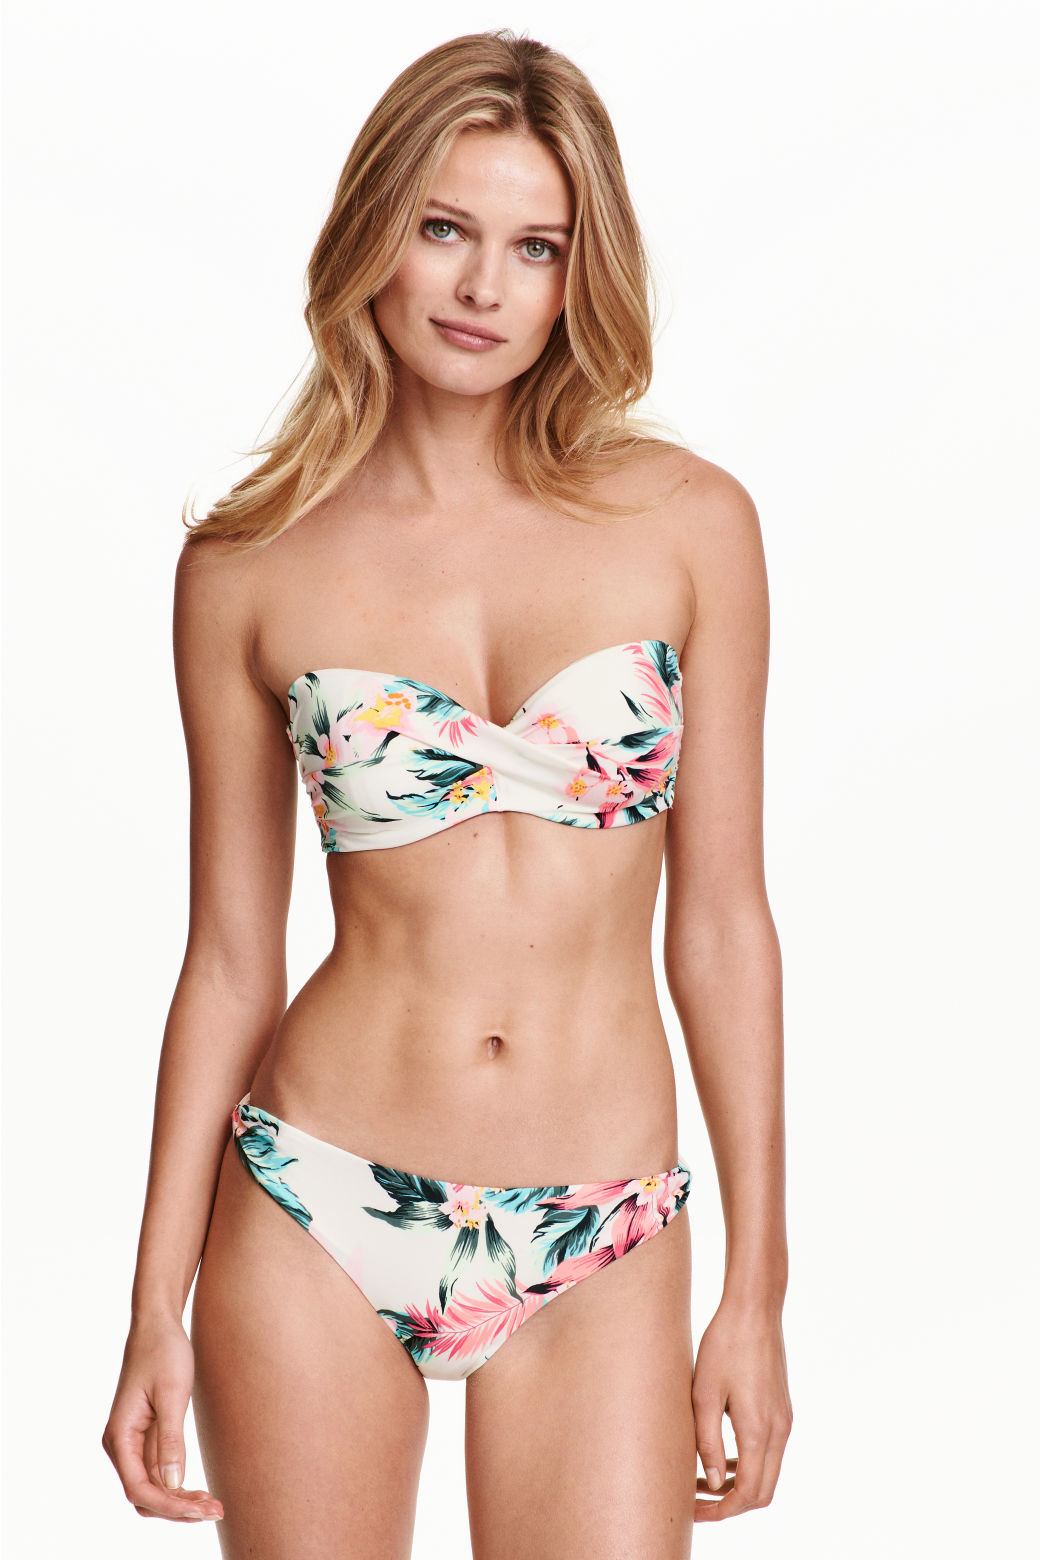 Bikini Bottom Teen Bedding Sets 52